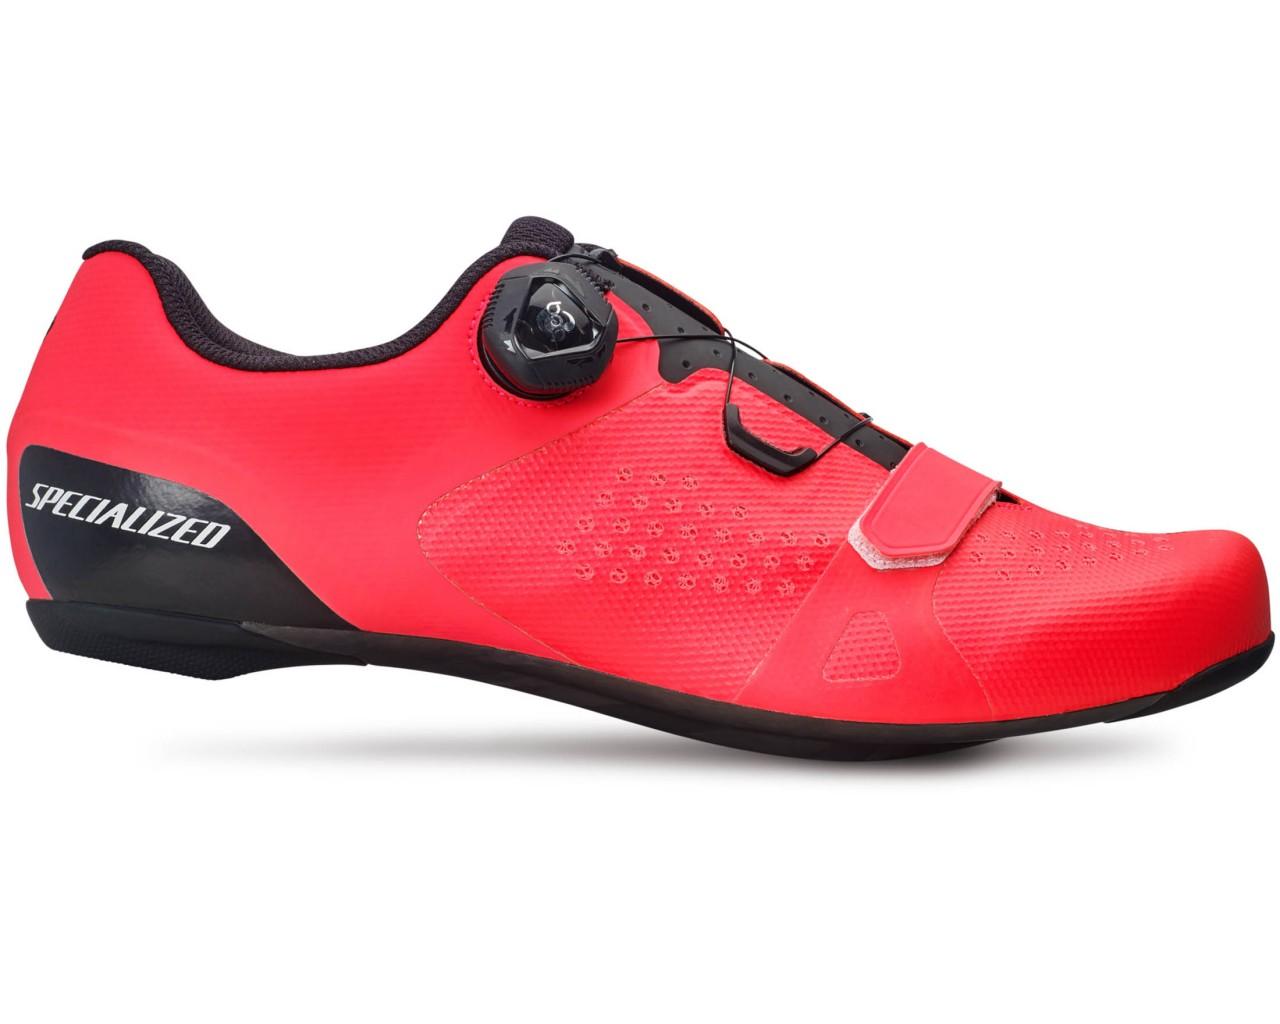 Specialized Torch 2.0 Damen Rennrad Schuhe | electric pink